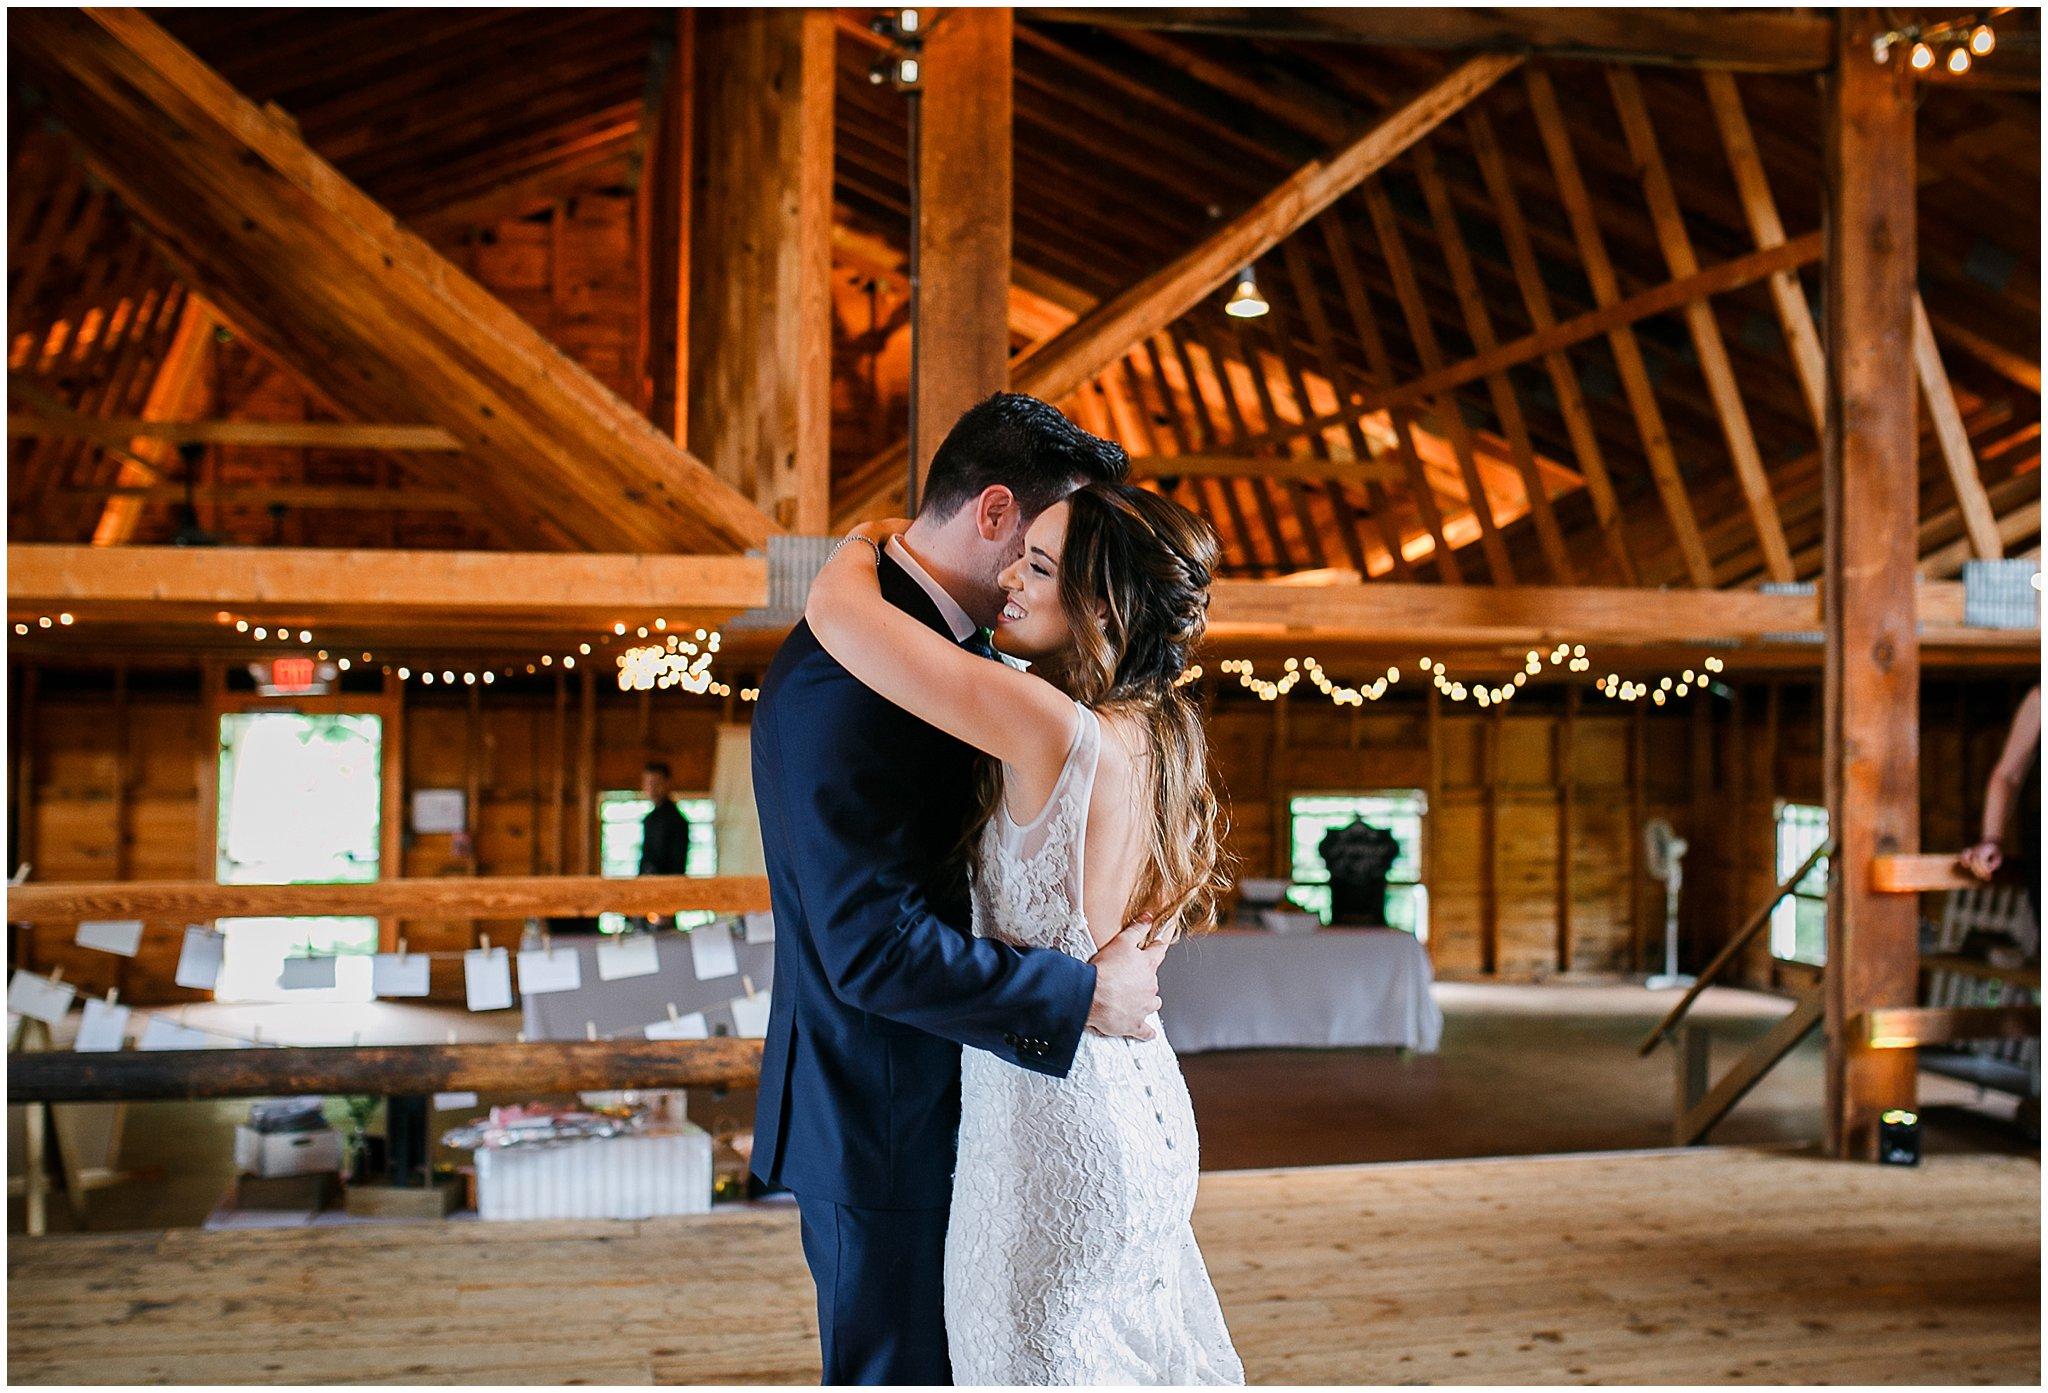 Hudson Valley Weddings at the Hill Hudson New York Wedding Photographer84.jpg